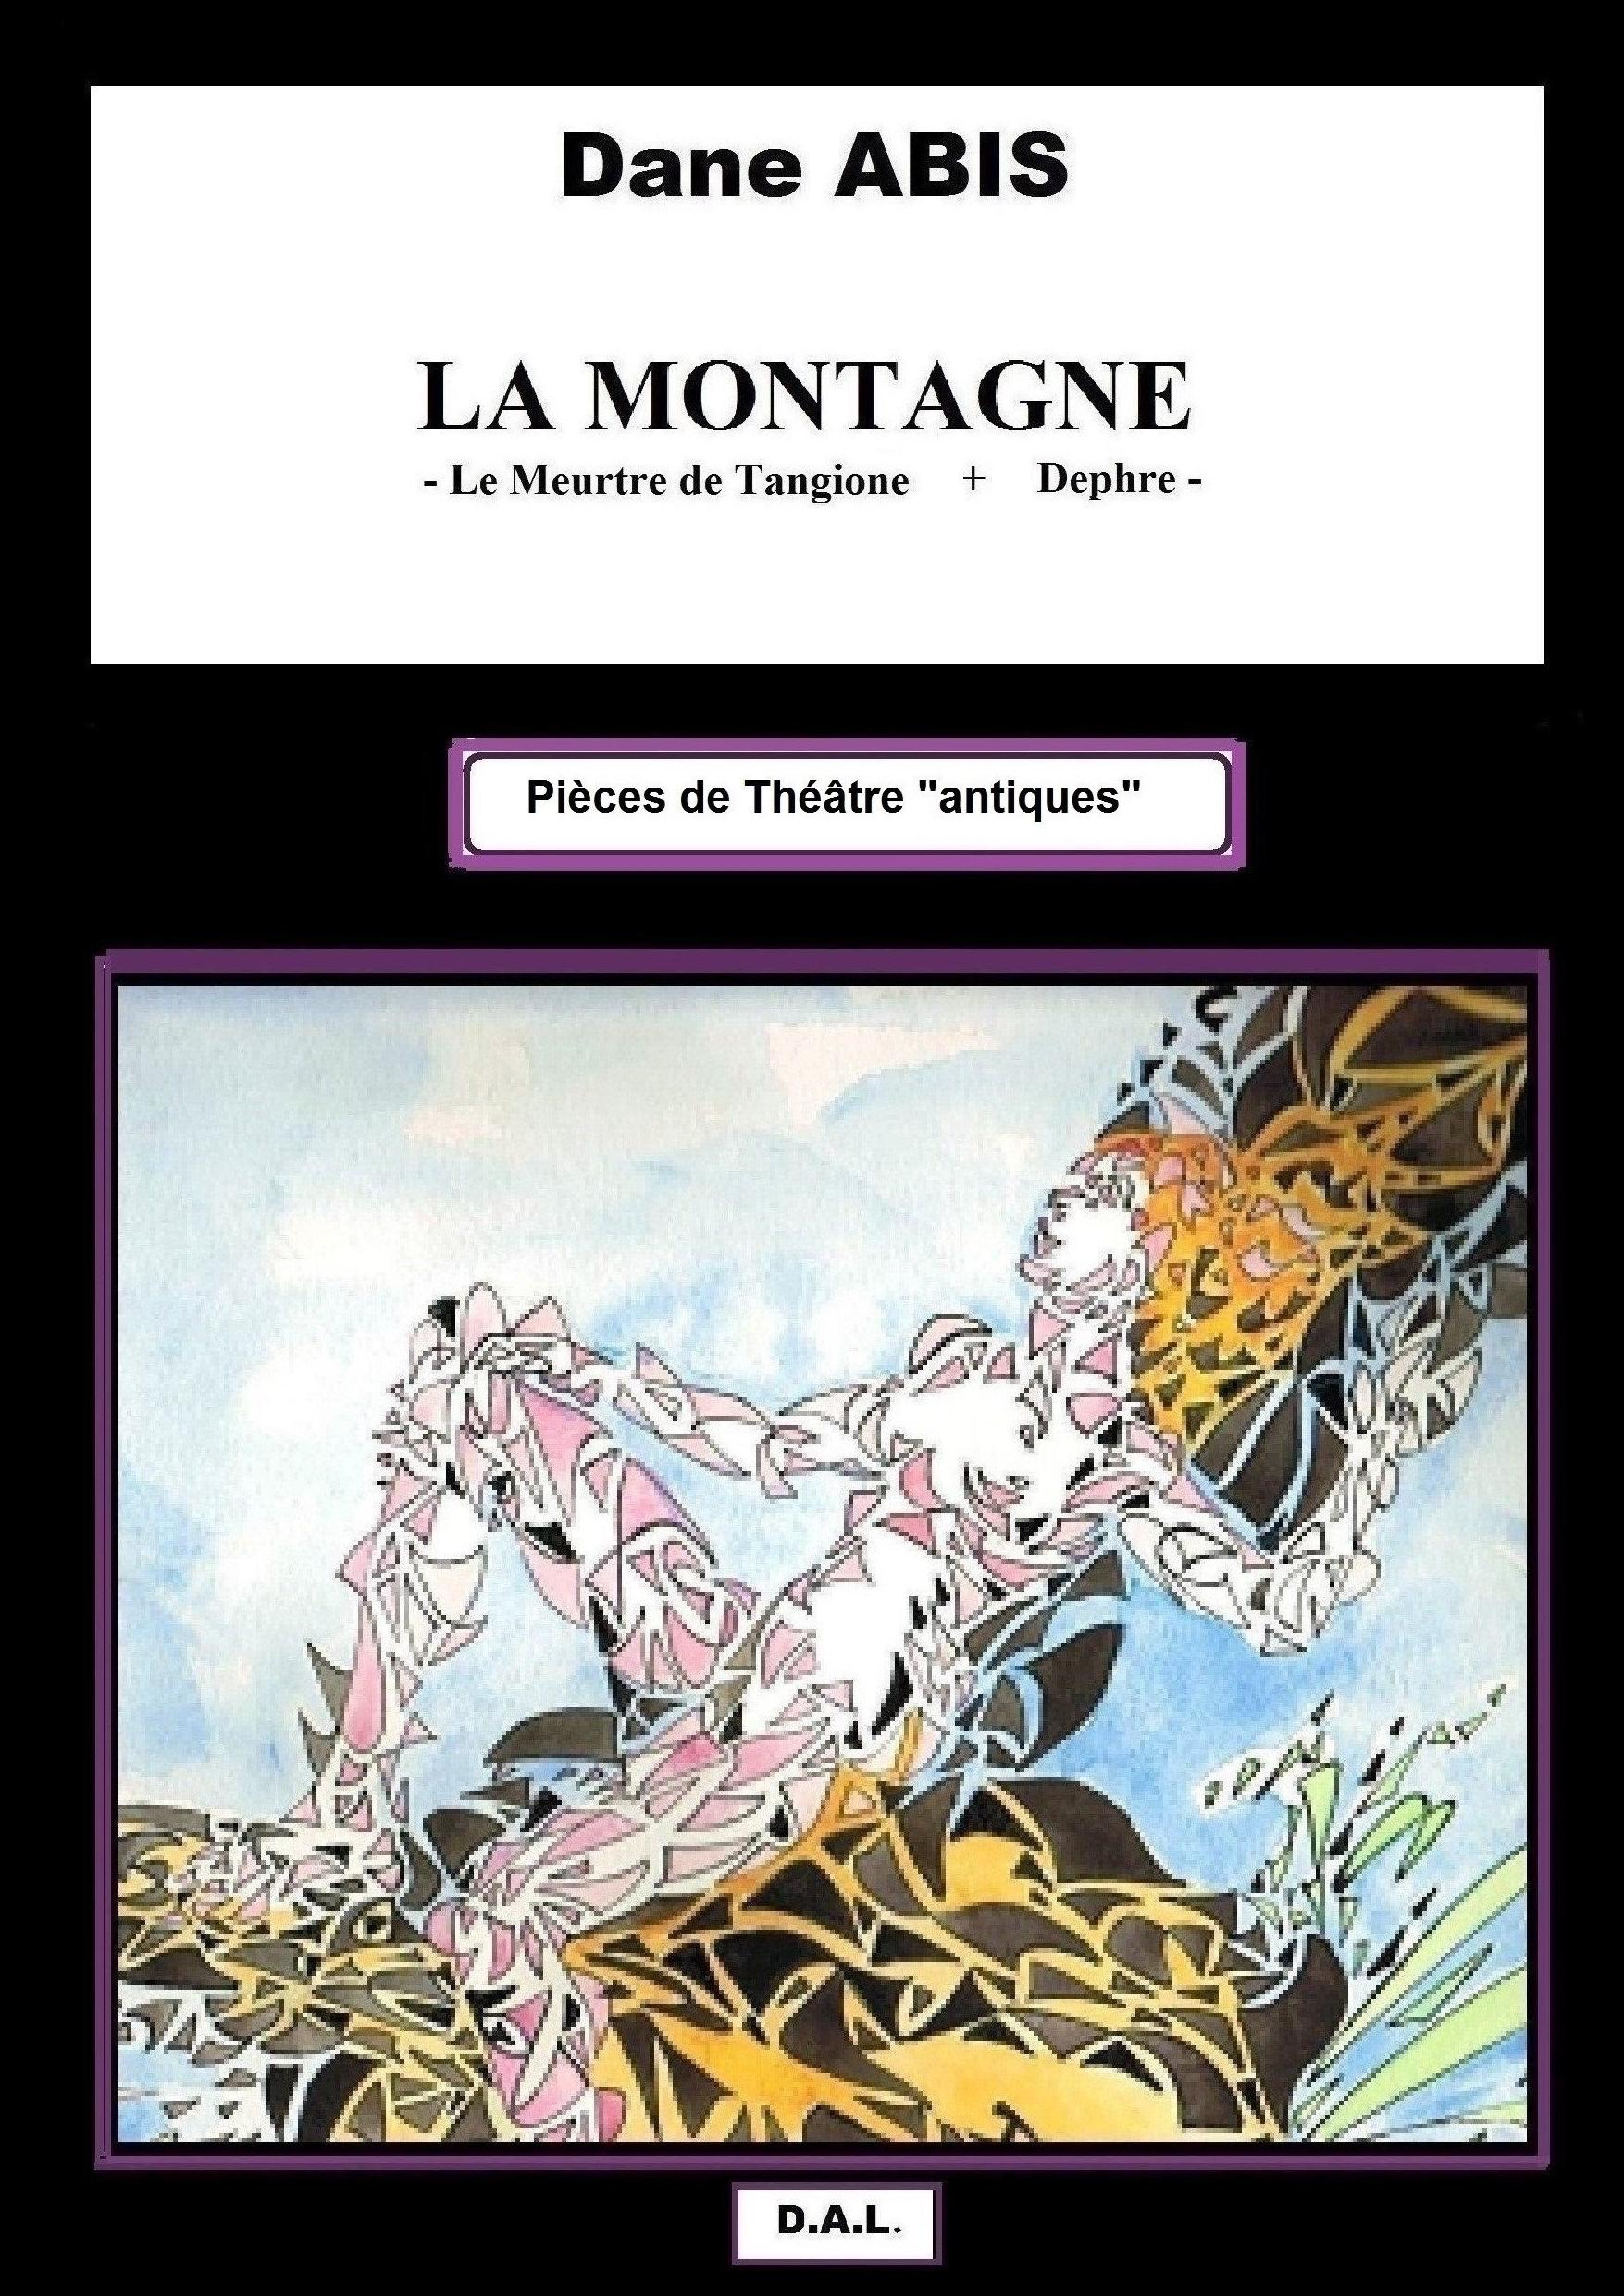 LA MONTAGNE (Tangione+Dephre)